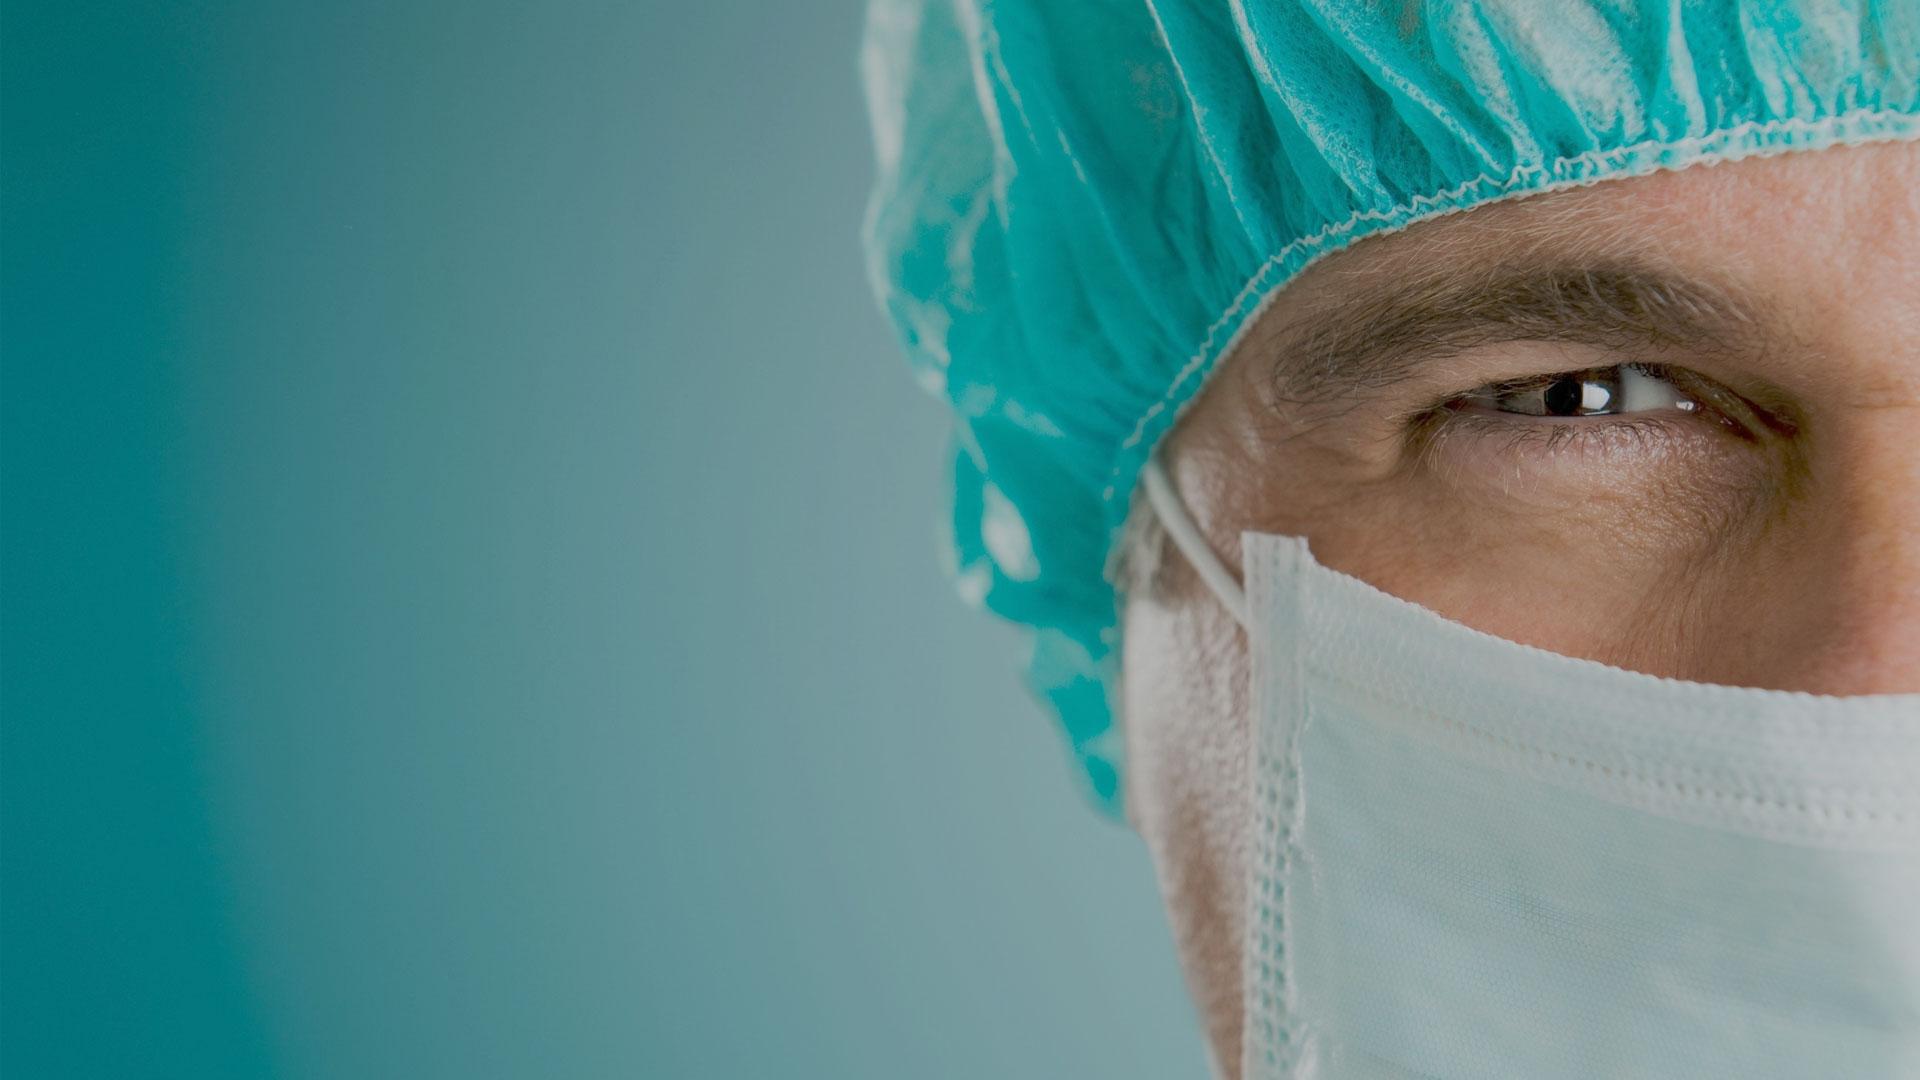 Cirurgia plástica responsável